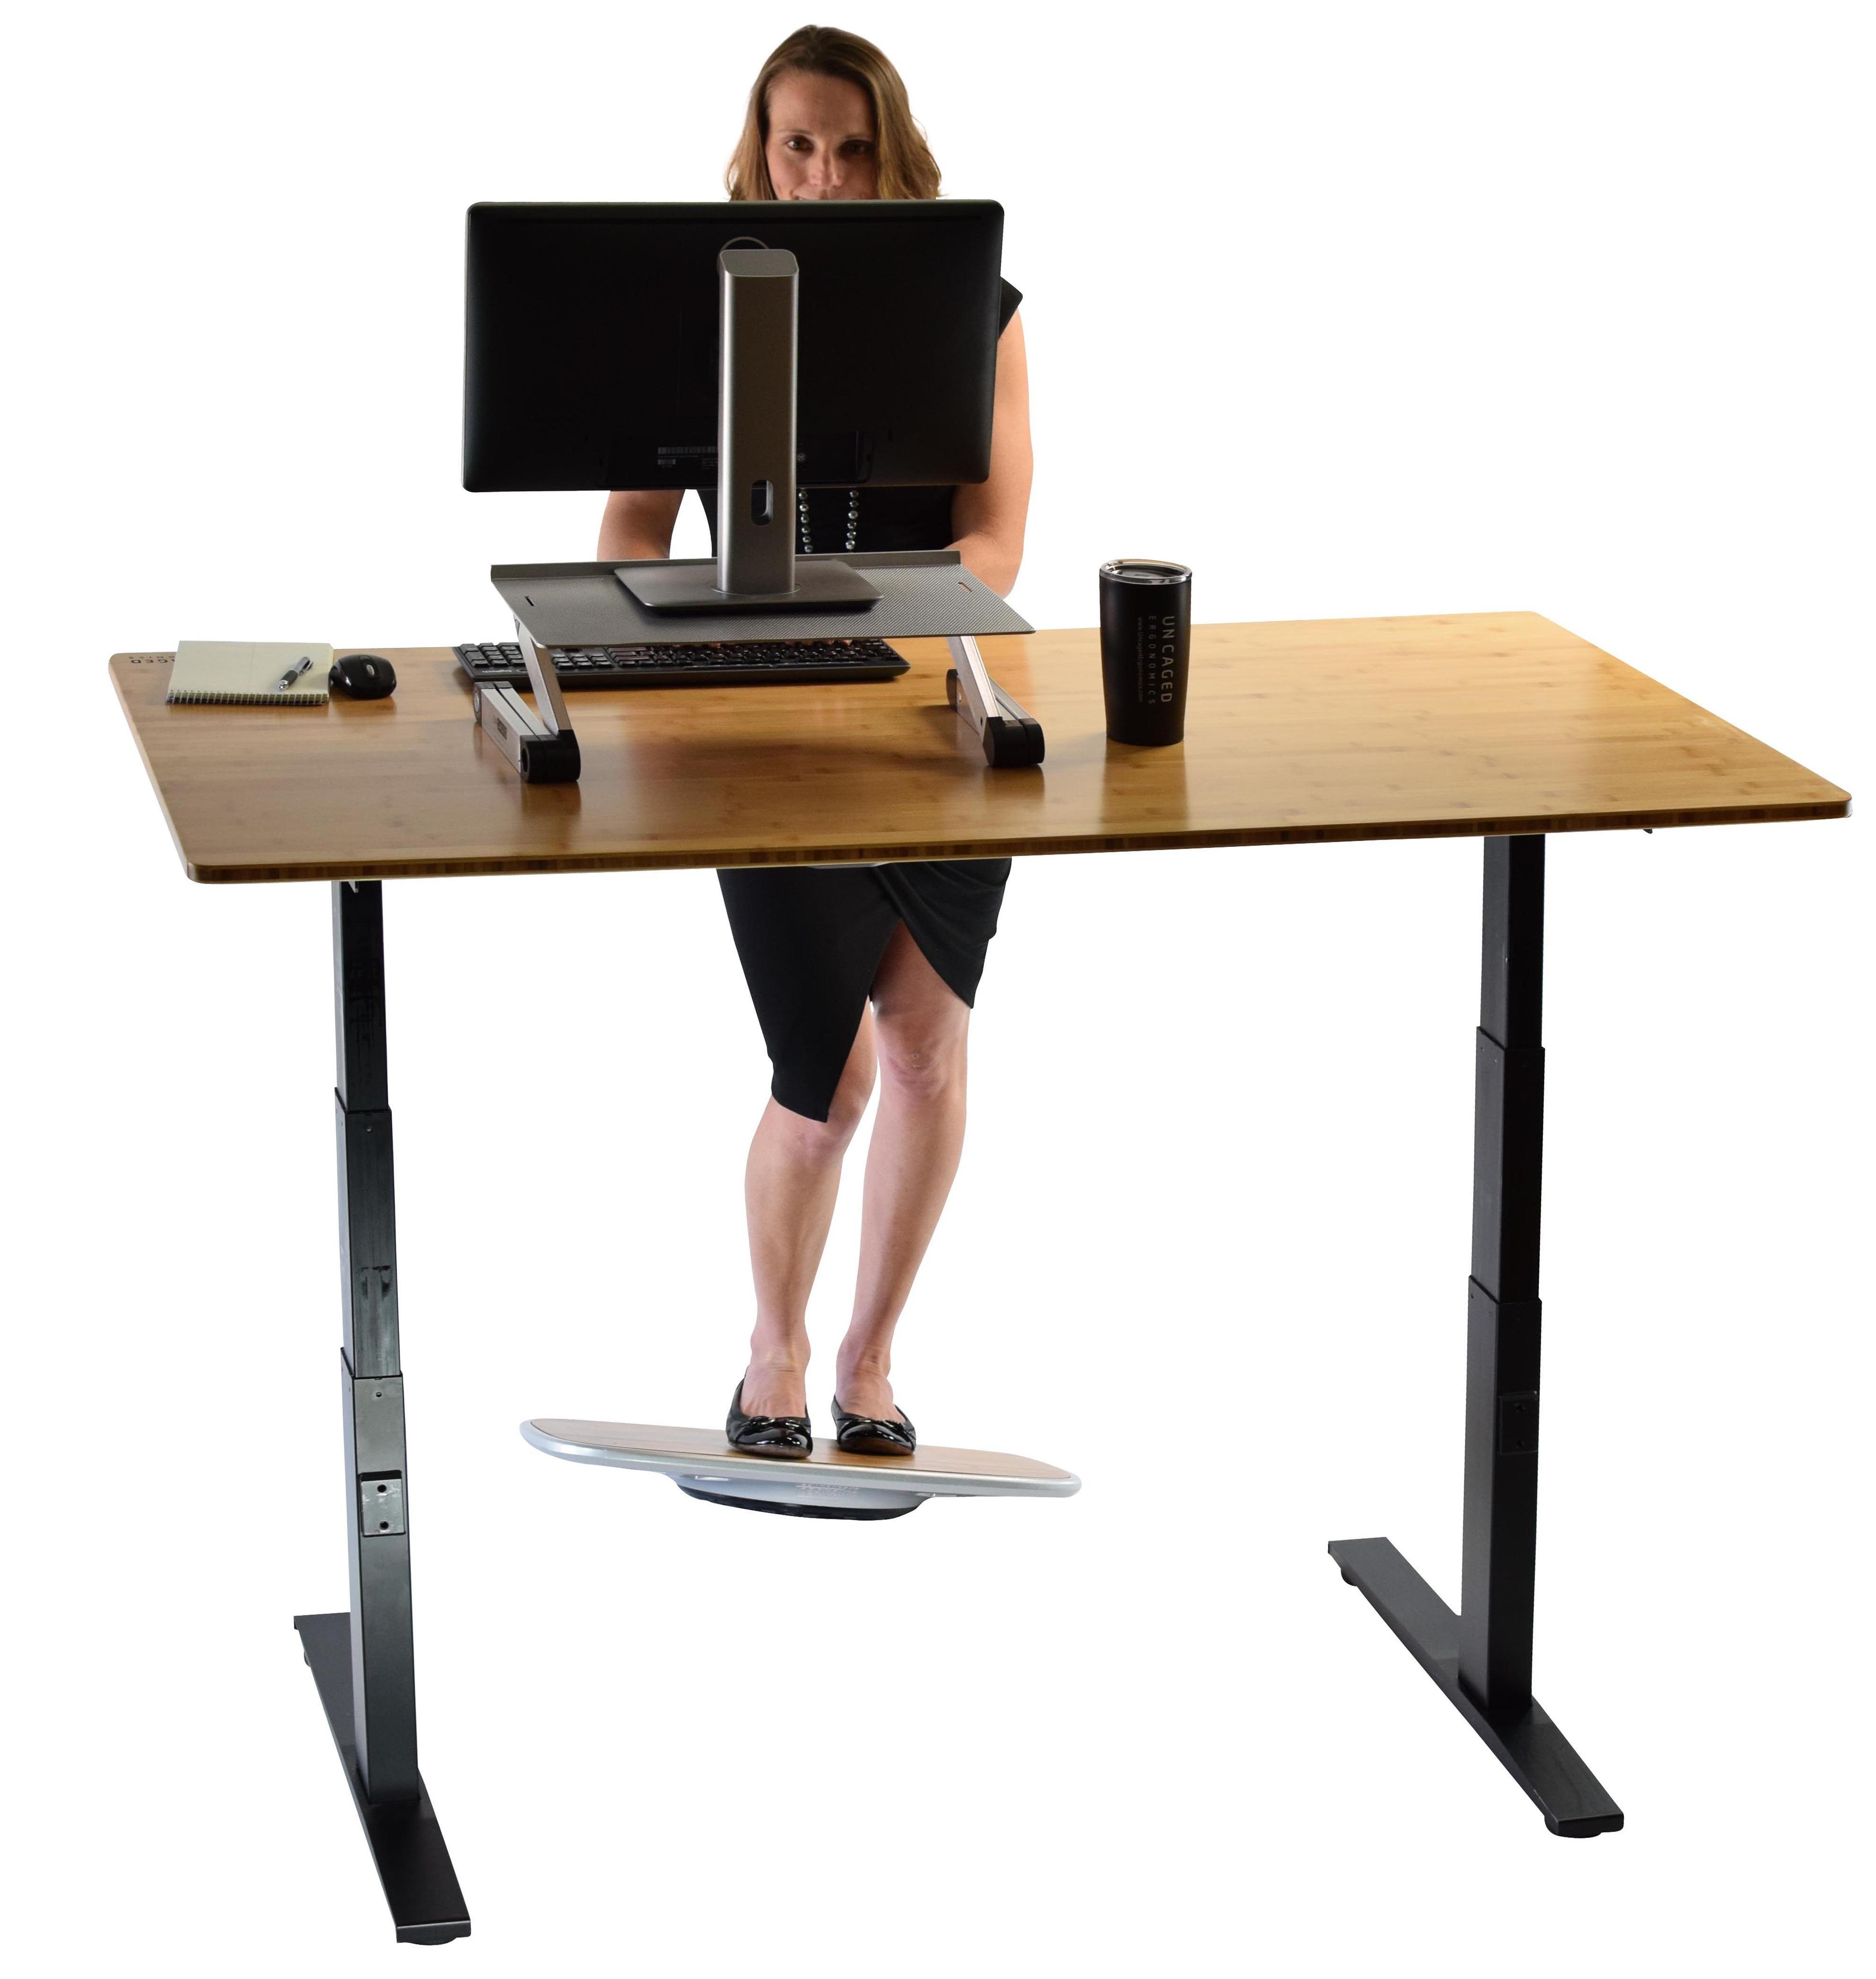 BASE Balance & Stability Board. Active Standing Desk